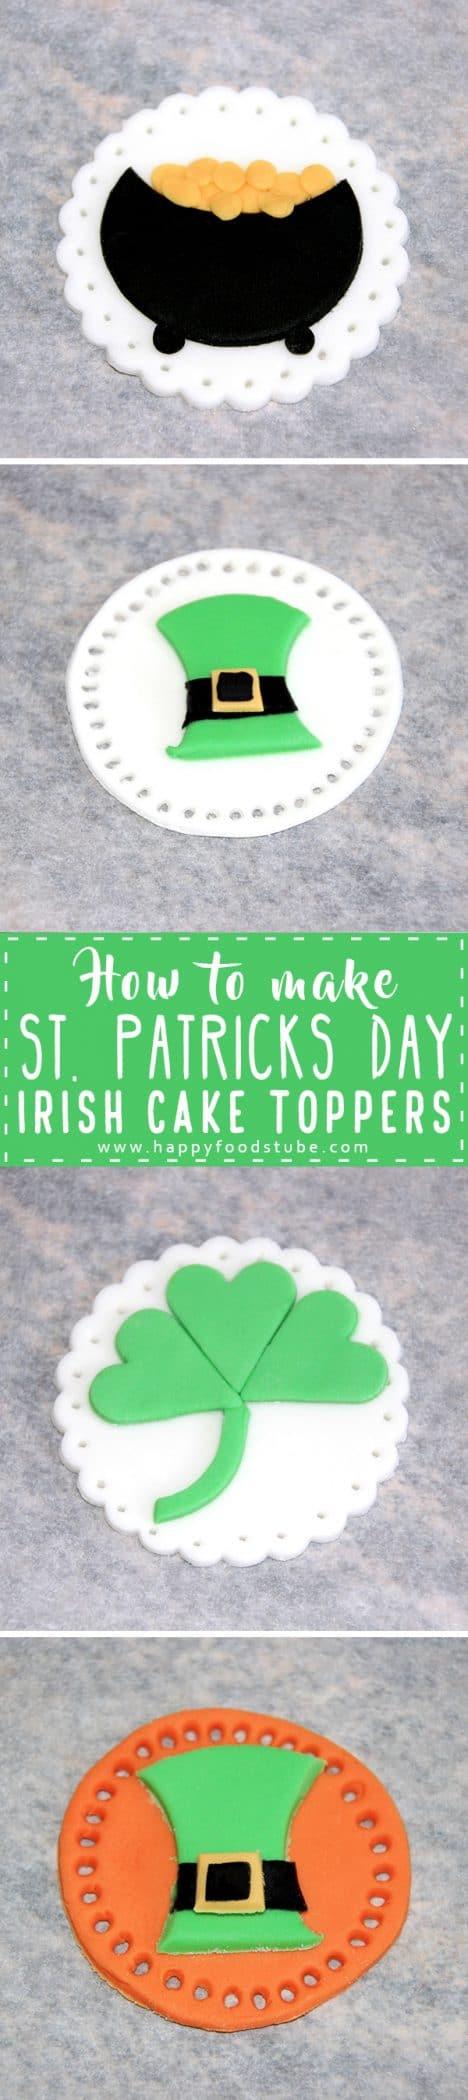 How to make St Patricks Day Irish Cake Toppers Tutorial